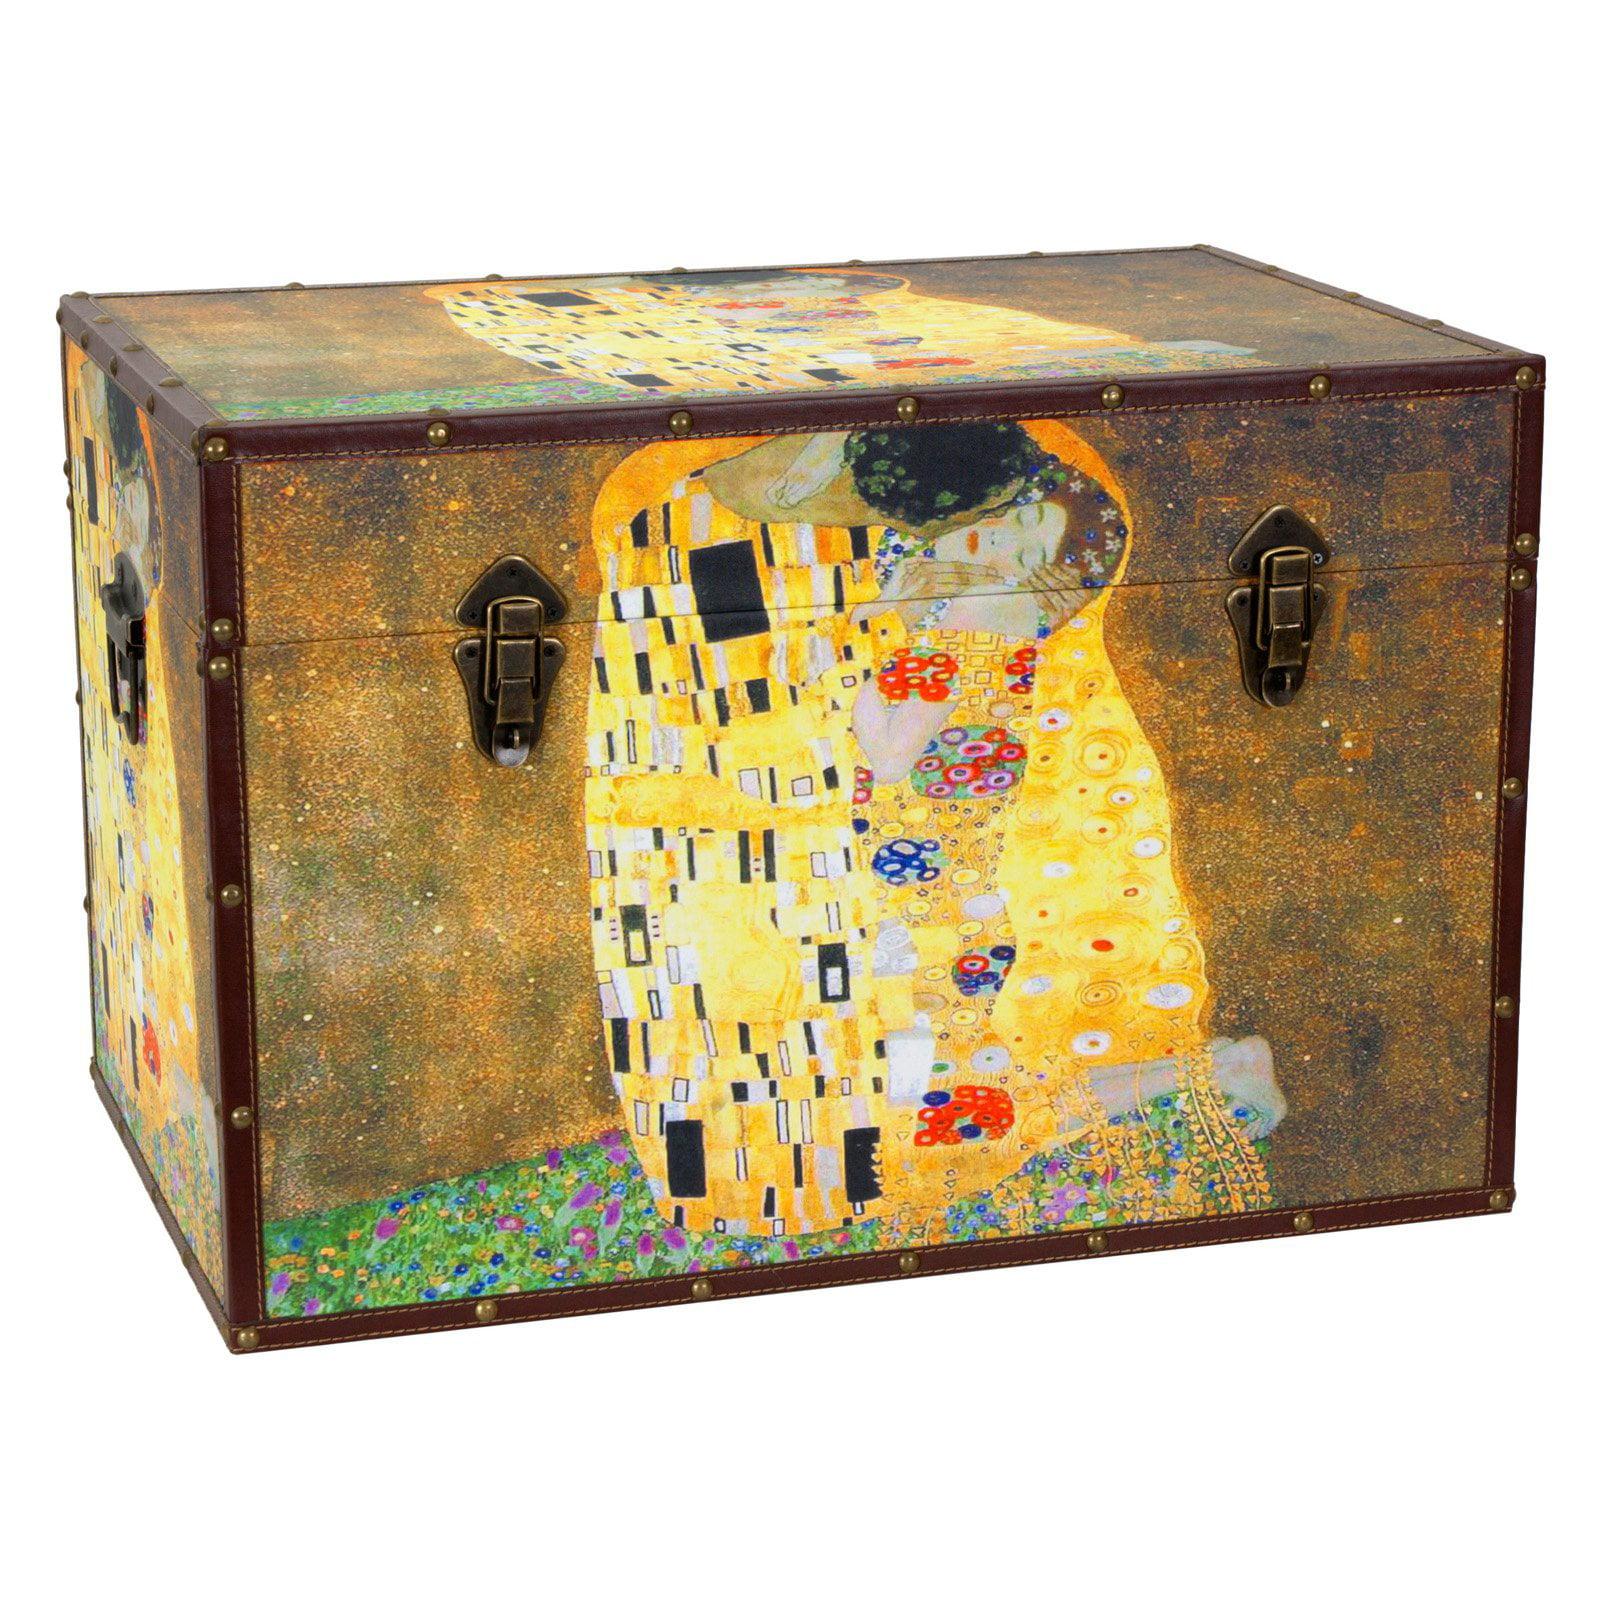 Oriental Furniture Works of Klimt Trunk